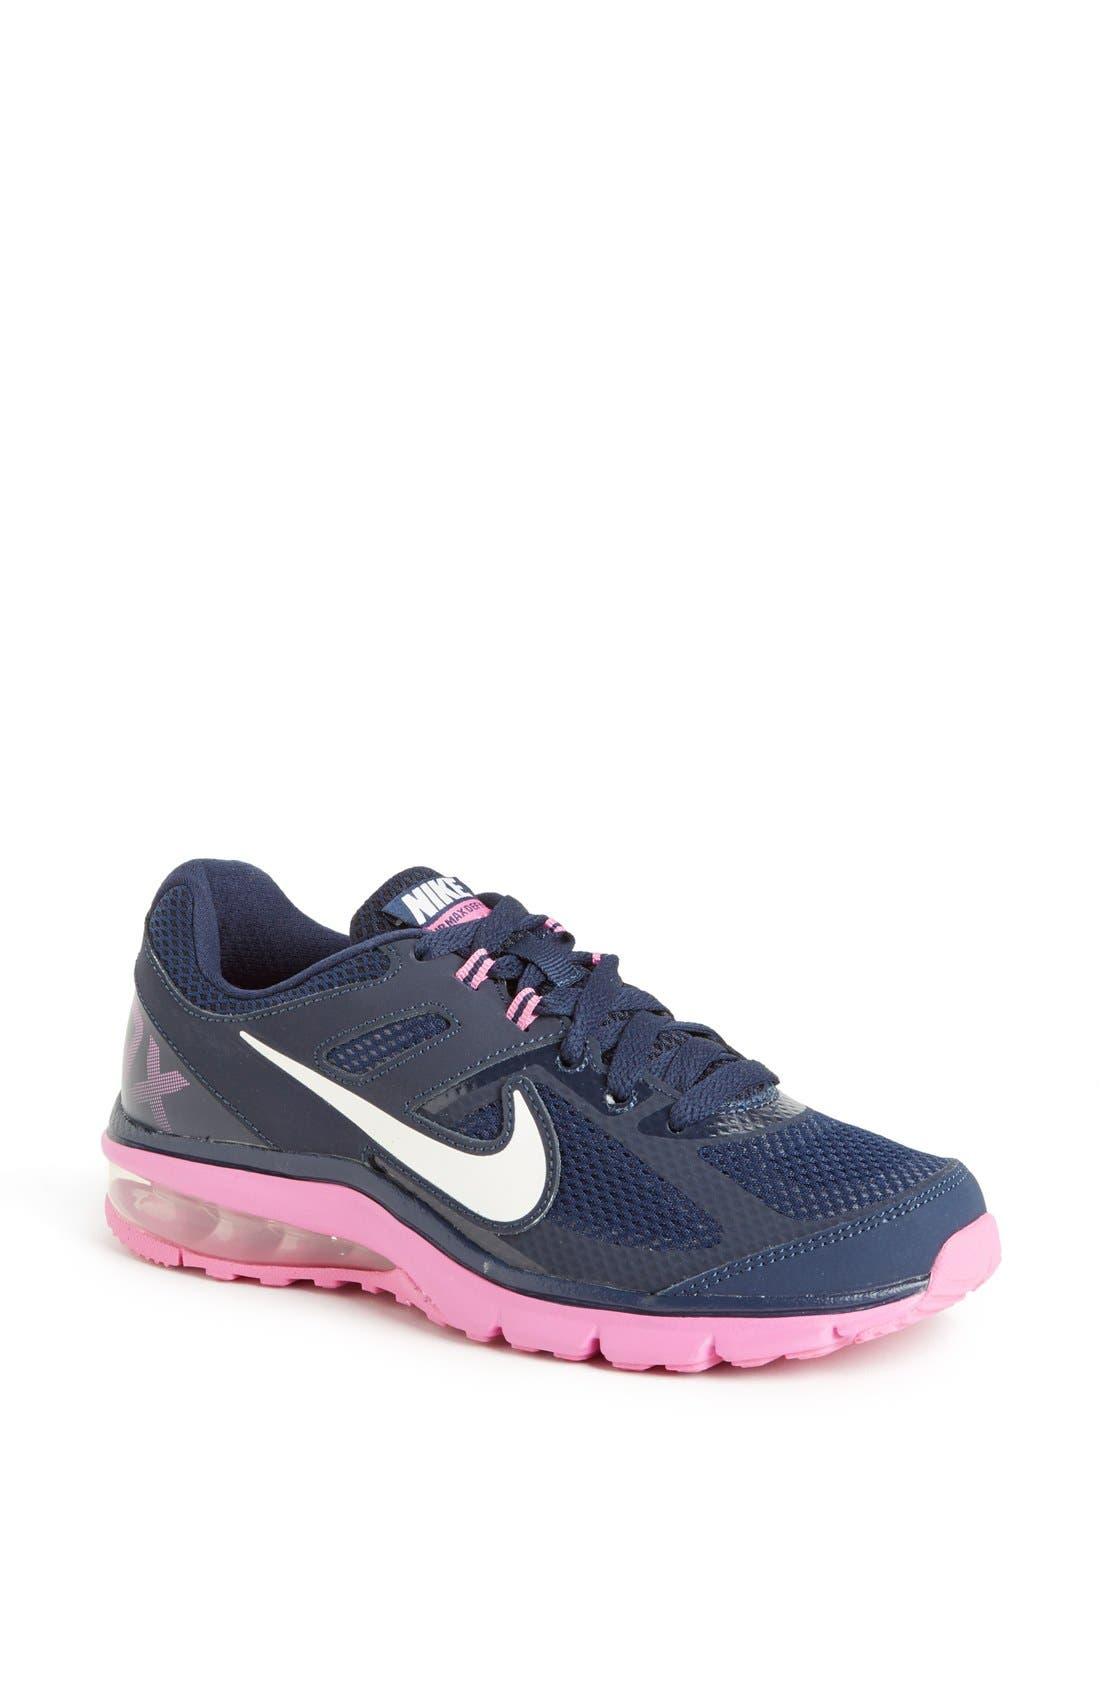 Alternate Image 1 Selected - Nike 'Air Max Defy' Running Shoe (Women)